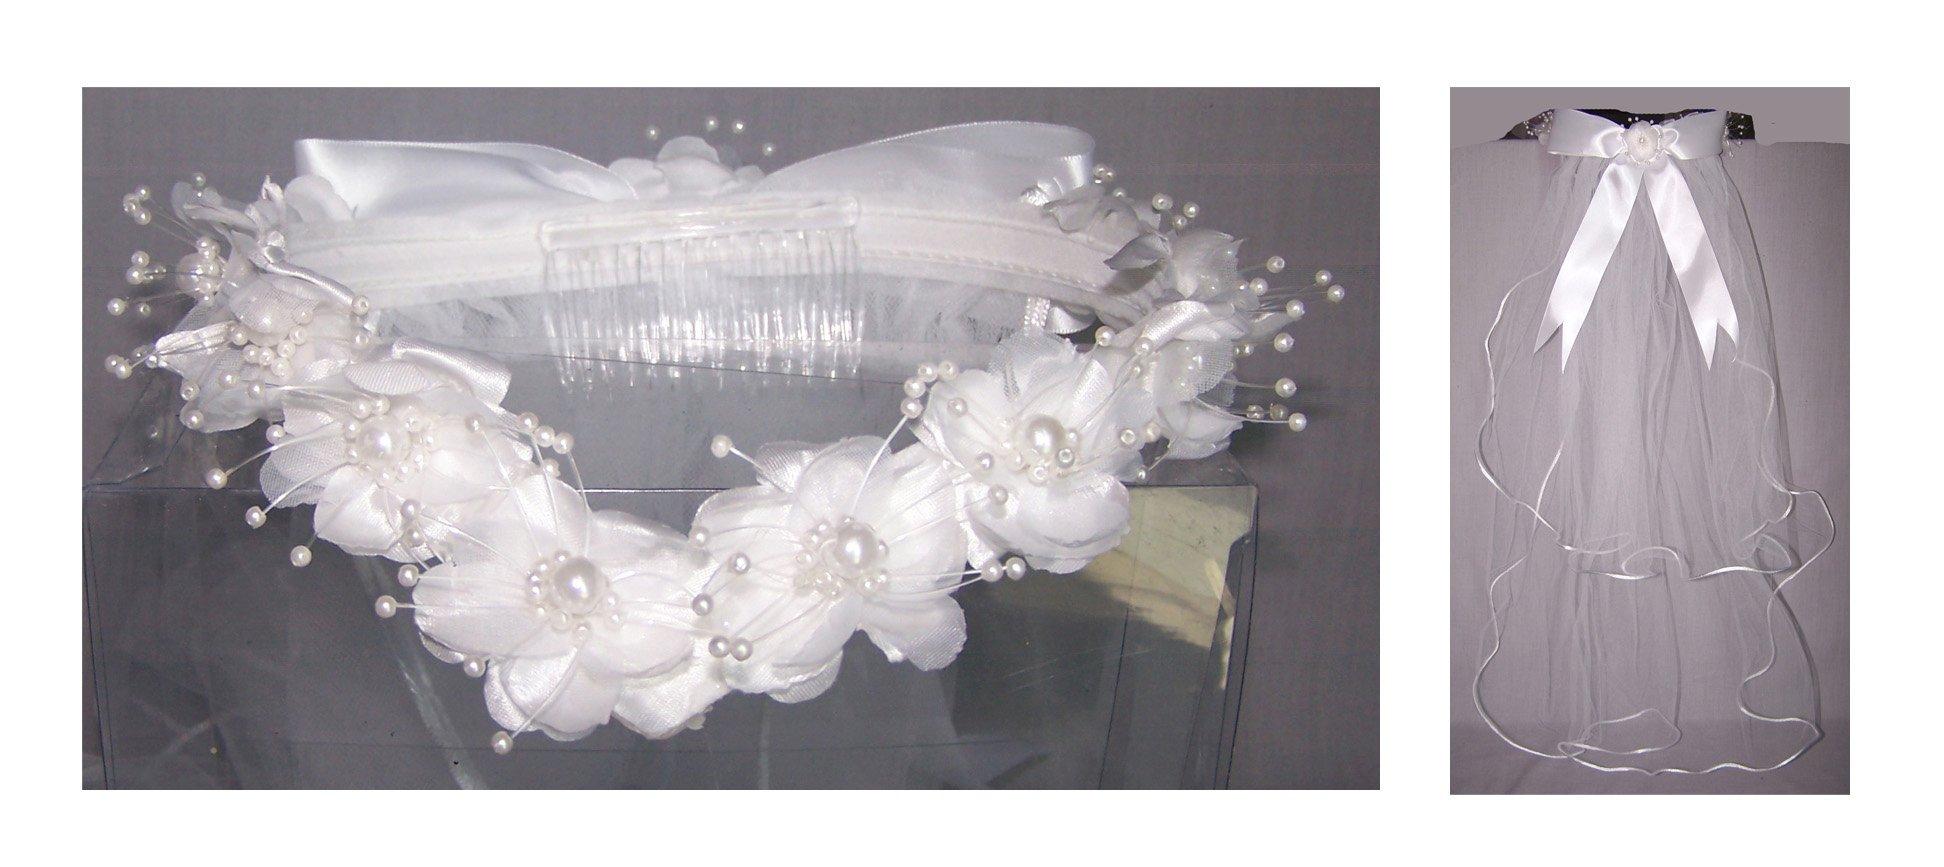 Handmade White Communion Veils With Flowered Tiara (Veil402 Z)